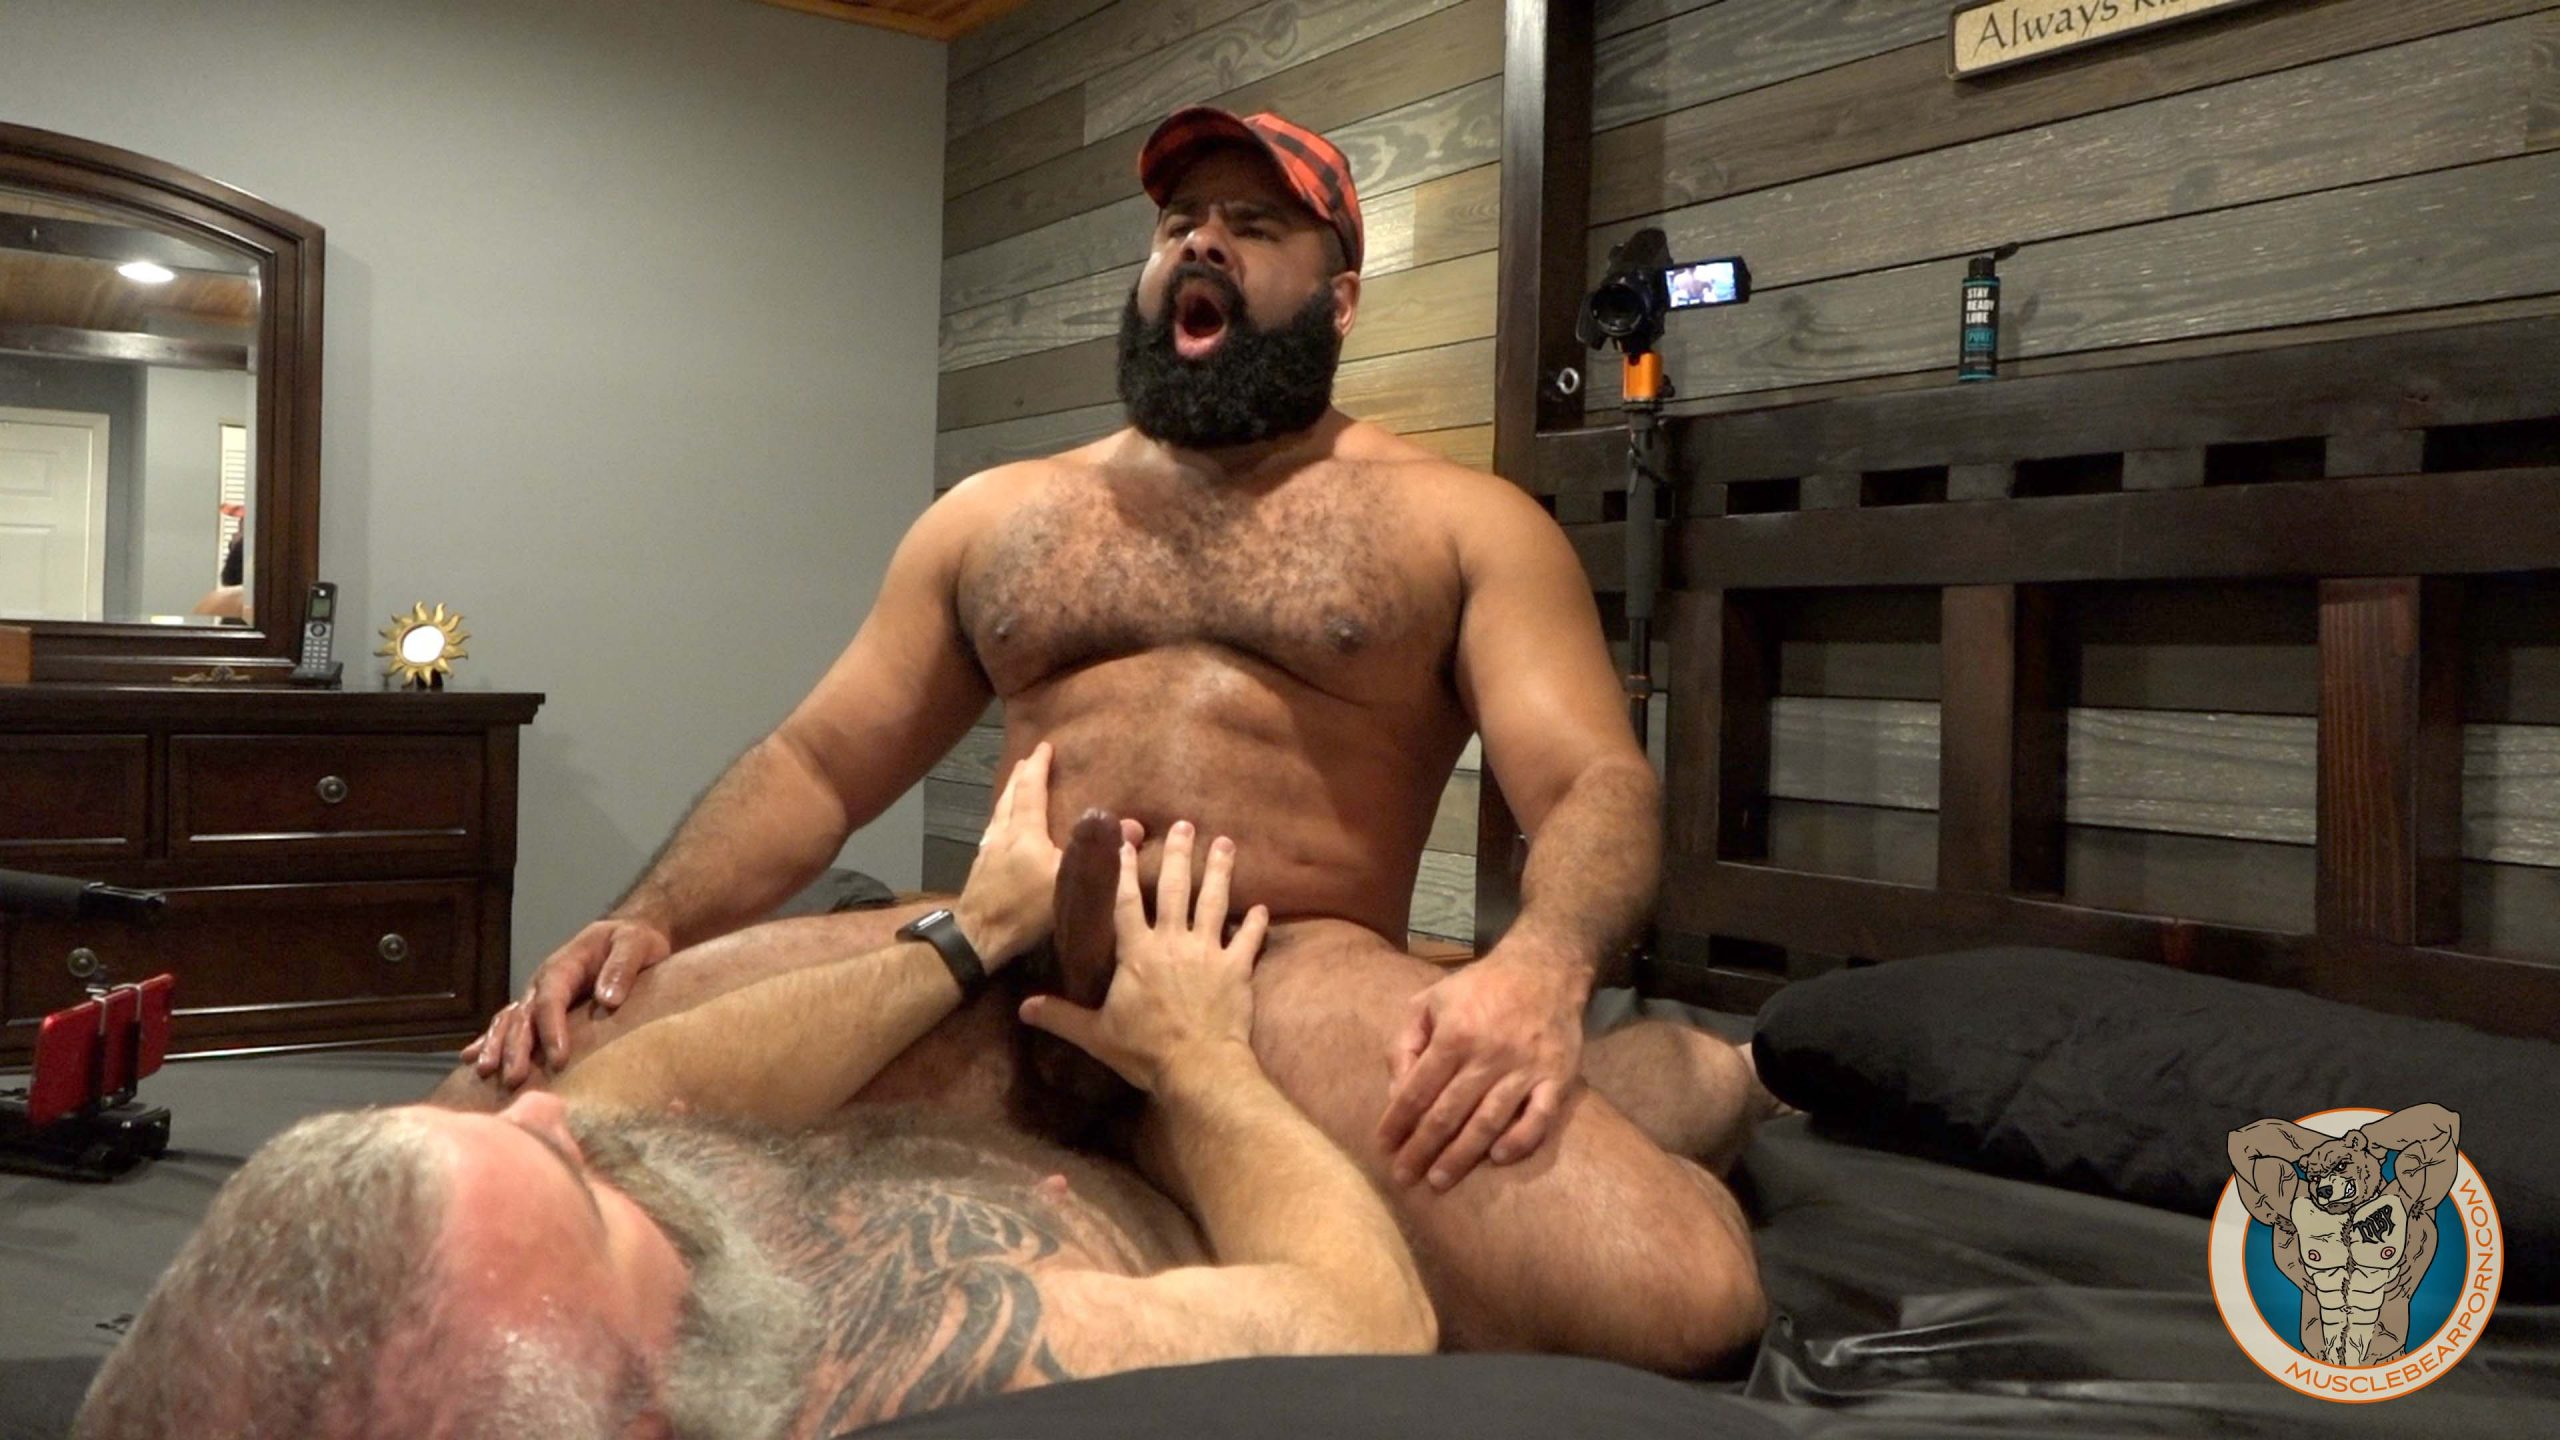 Porno gay bear BearFilms